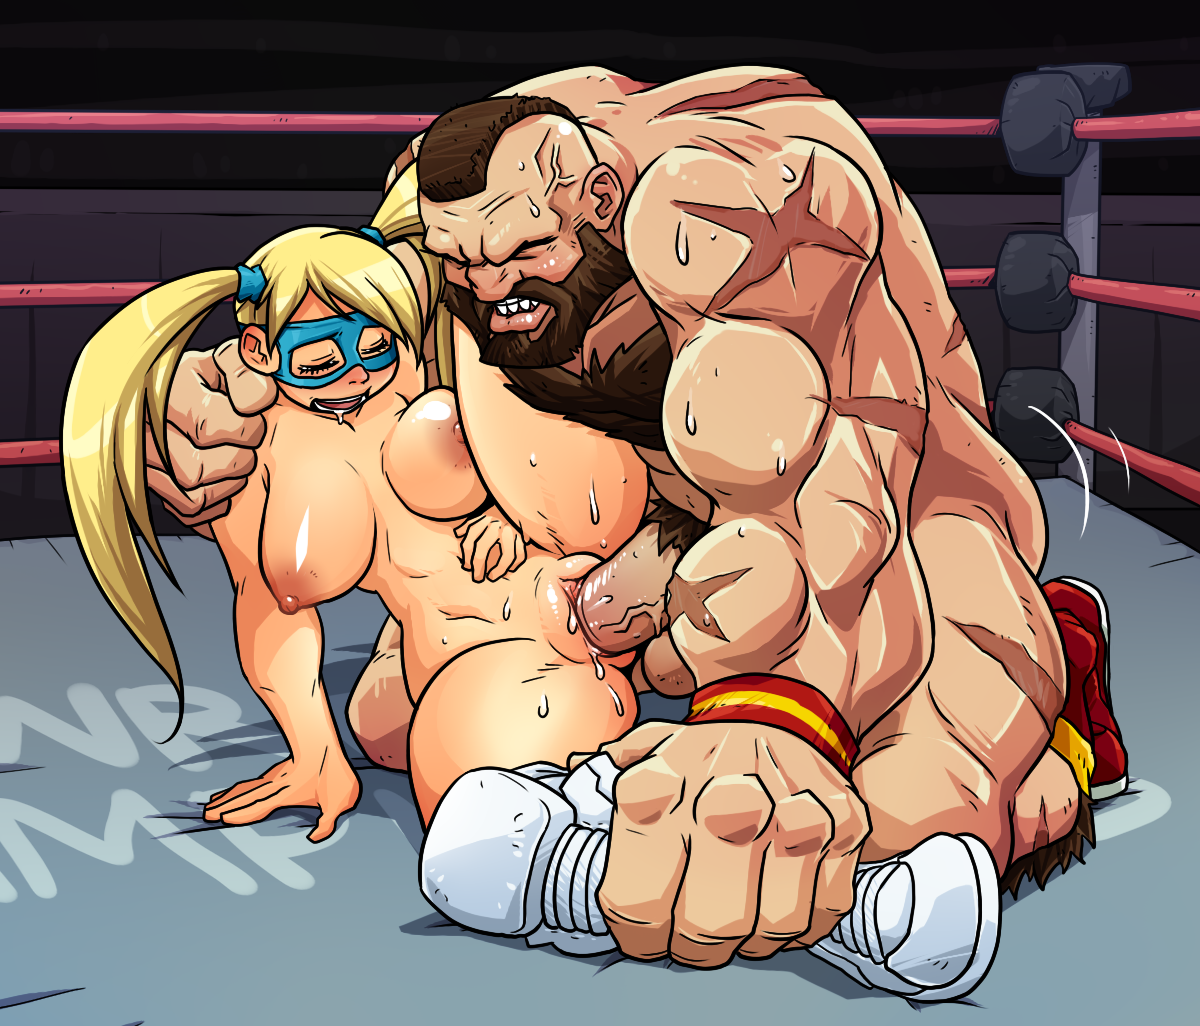 Hentai Fighter in rainbow mika and zangief (street fighter) drawncatunder - danbooru